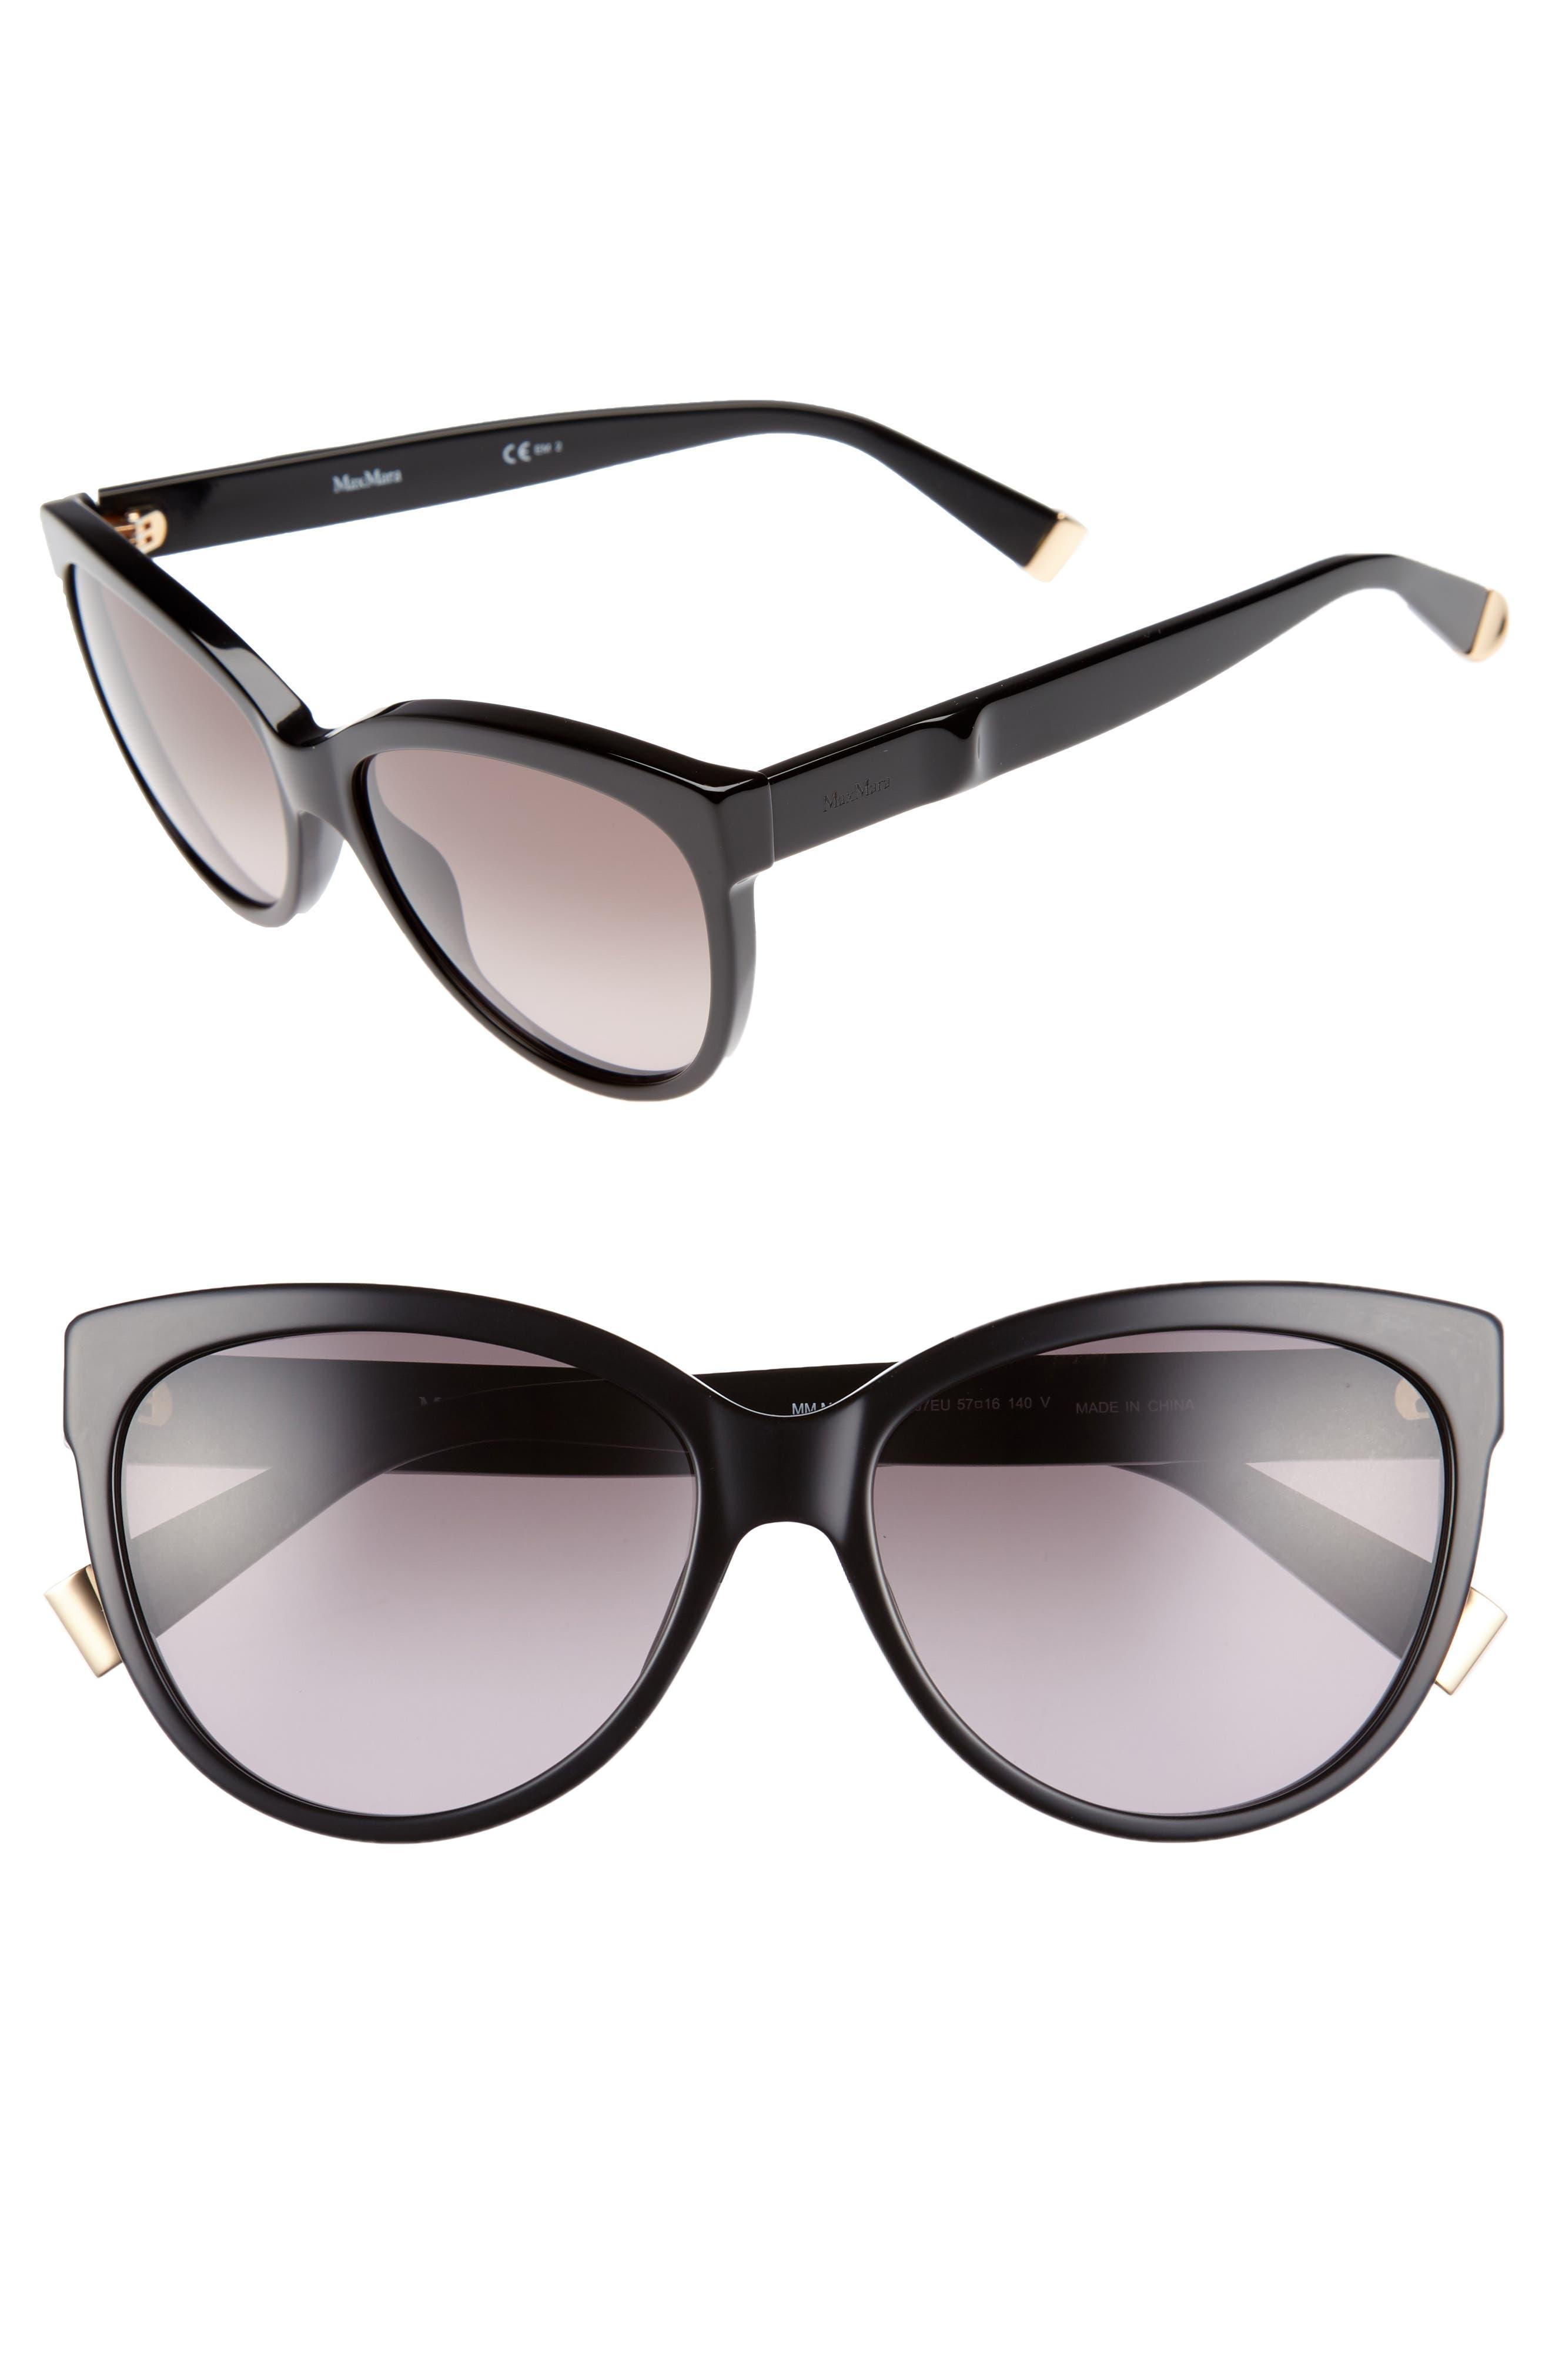 Moderii 57mm Gradient Cat Eye Sunglasses,                         Main,                         color,